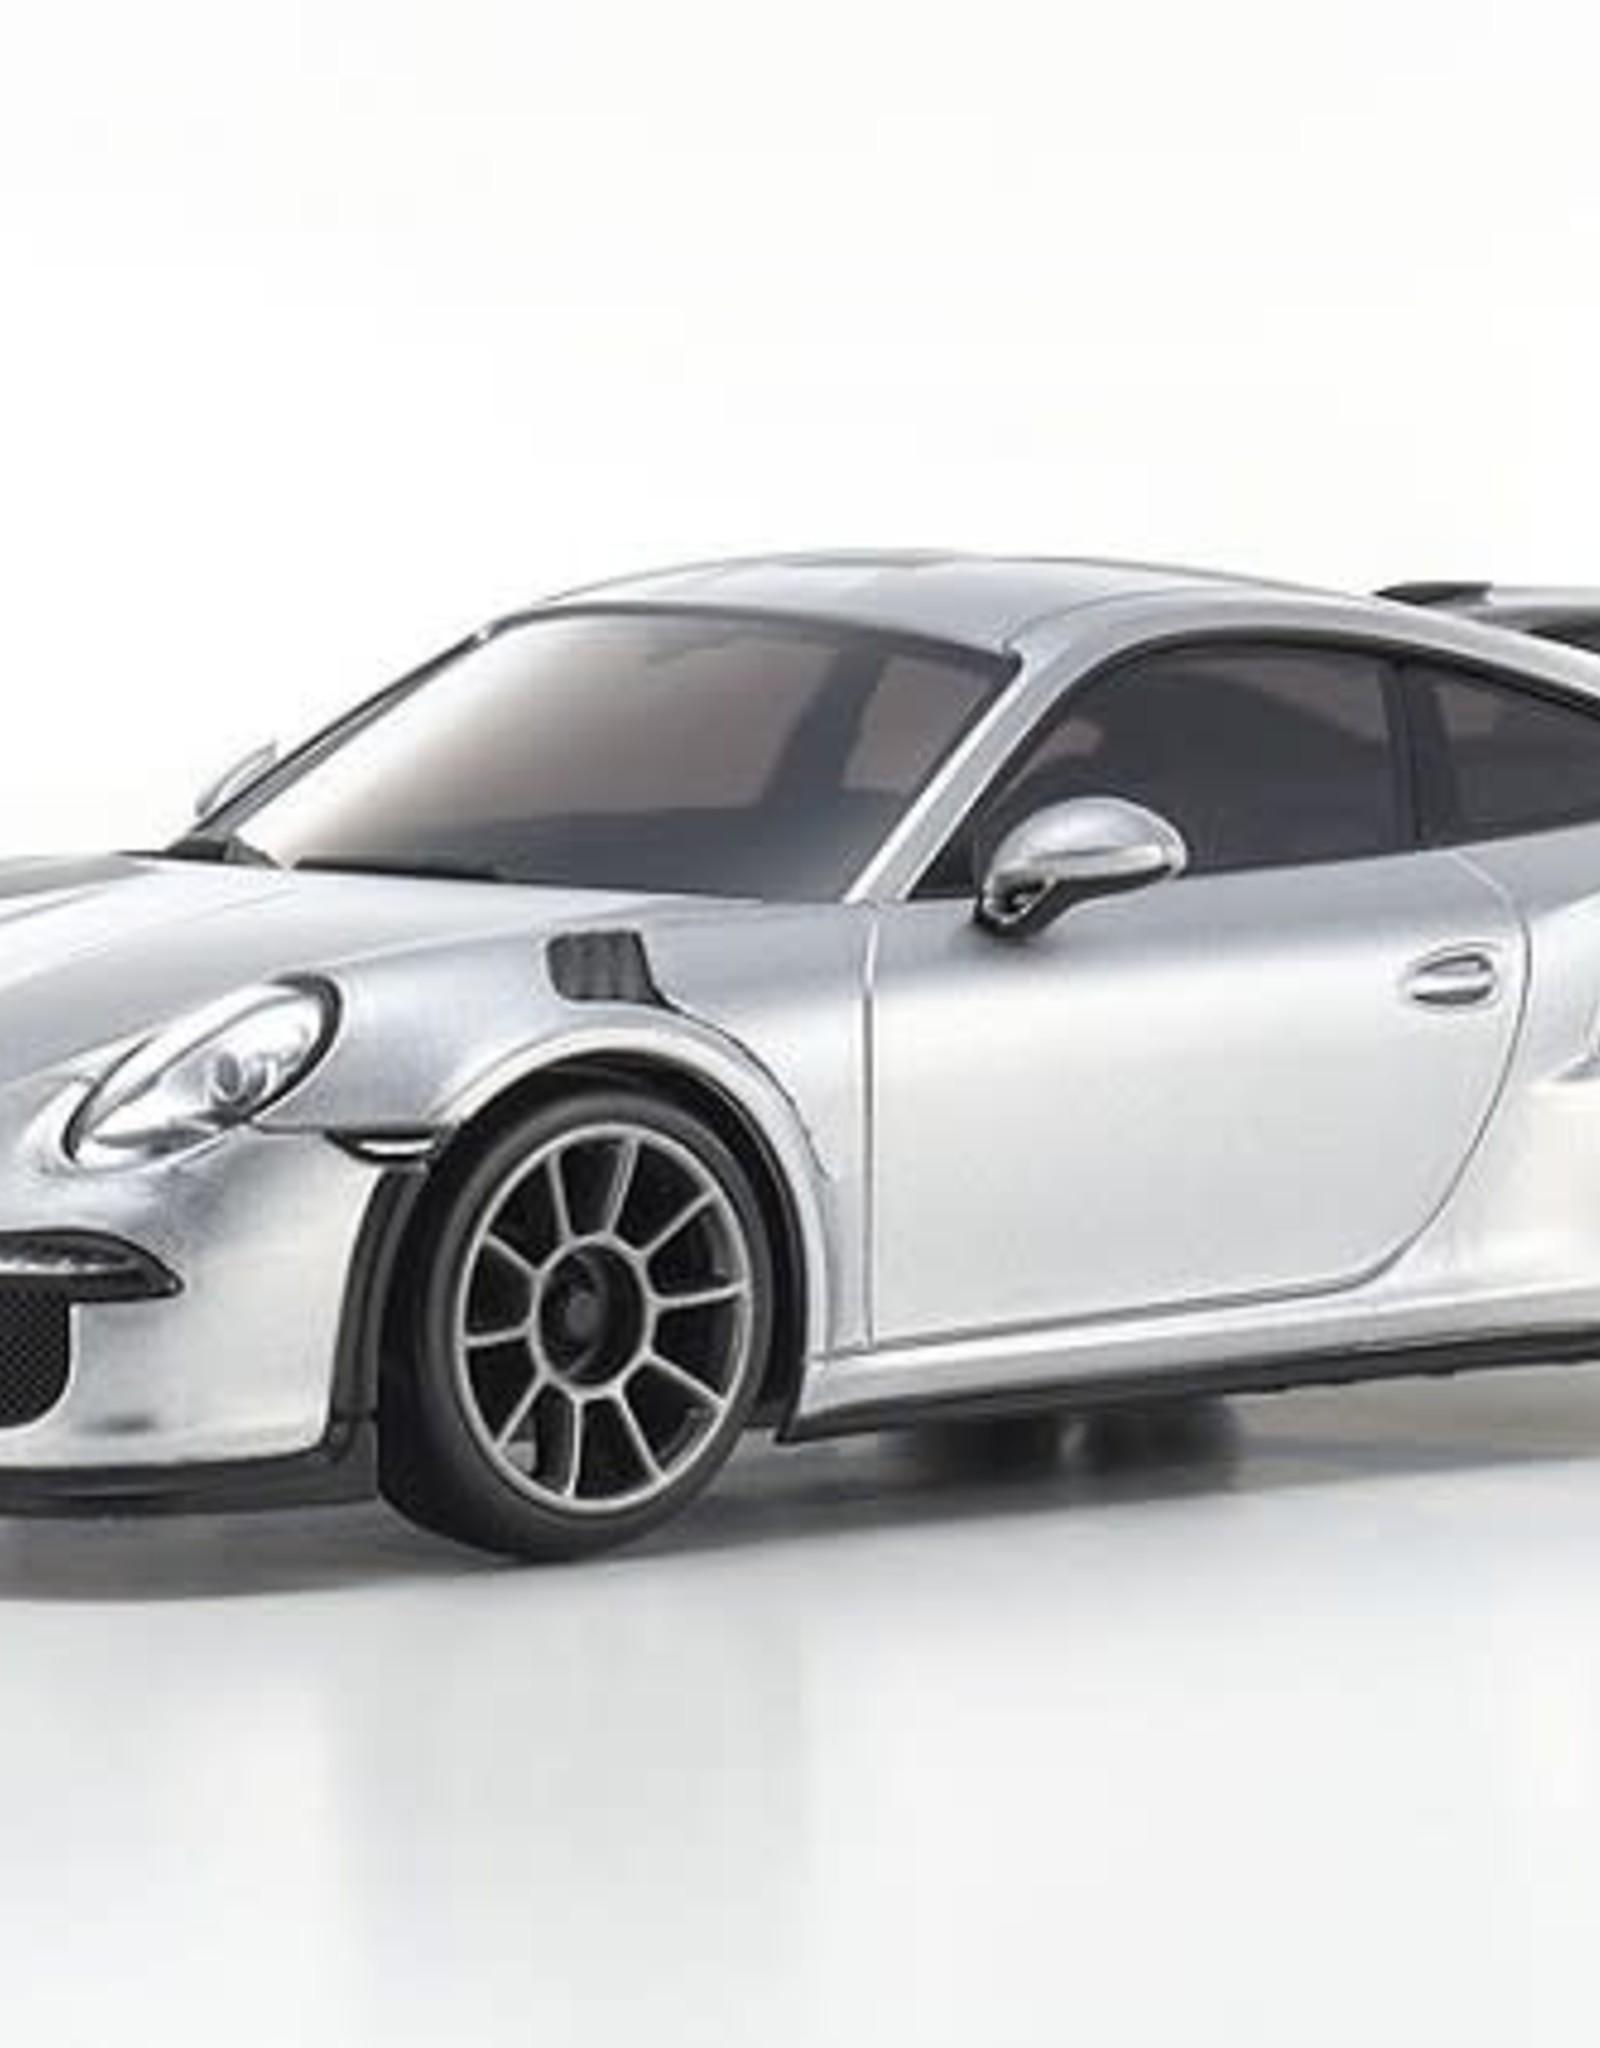 KYOSHO KYOMZP150S-B ASC MR-03N-RM Porsche 911 GT3